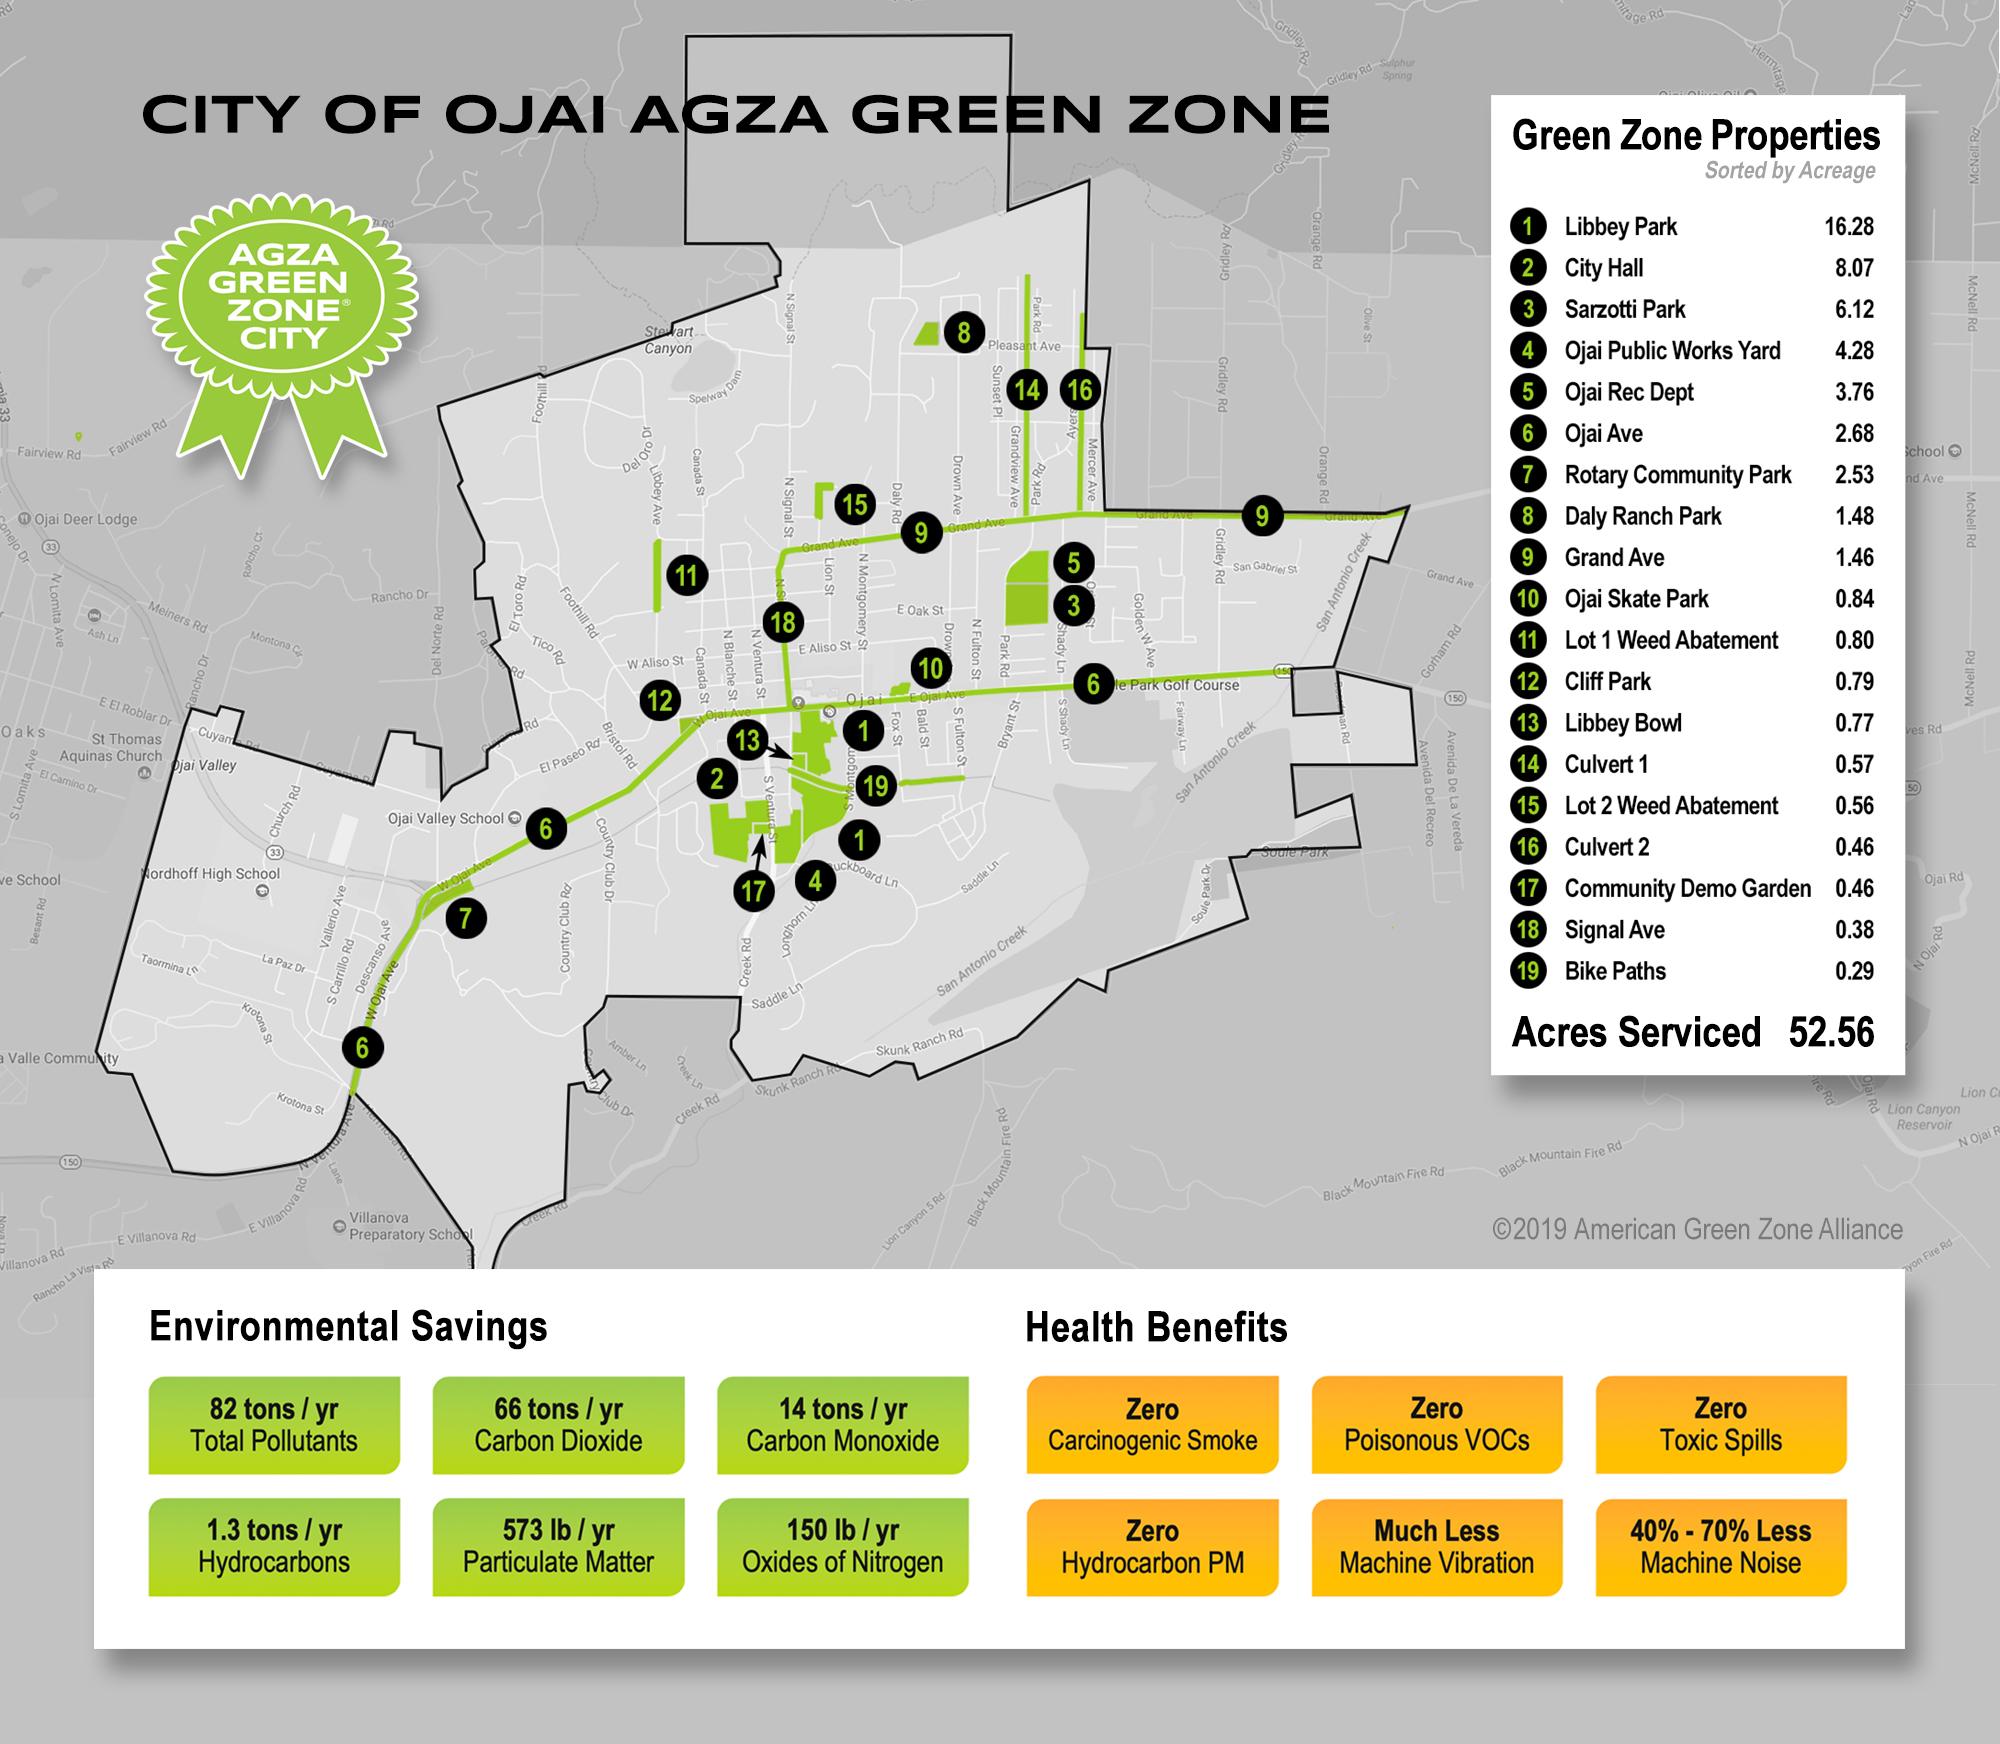 AGZA_GZ_Ojai_Map_with_Metrics_NO_HEADER_2000px.jpg